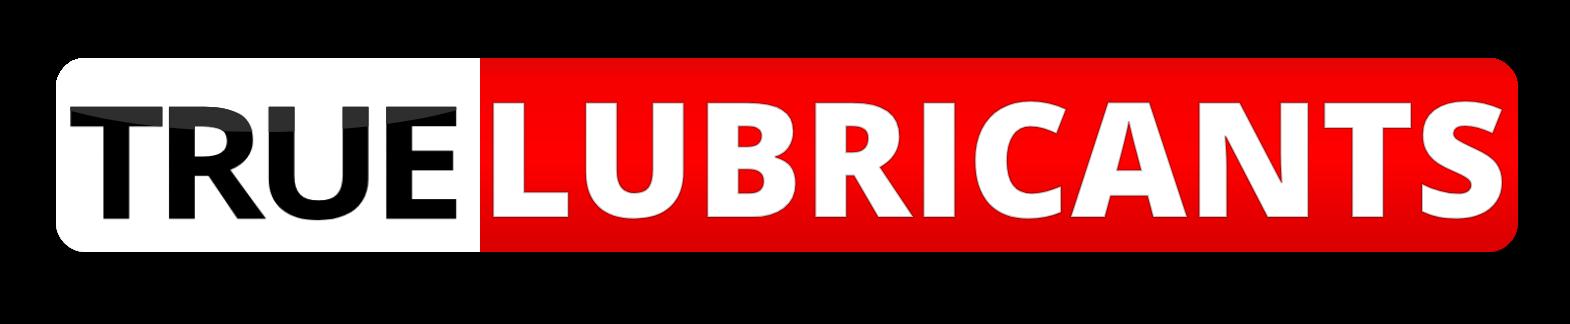 True Lubricants